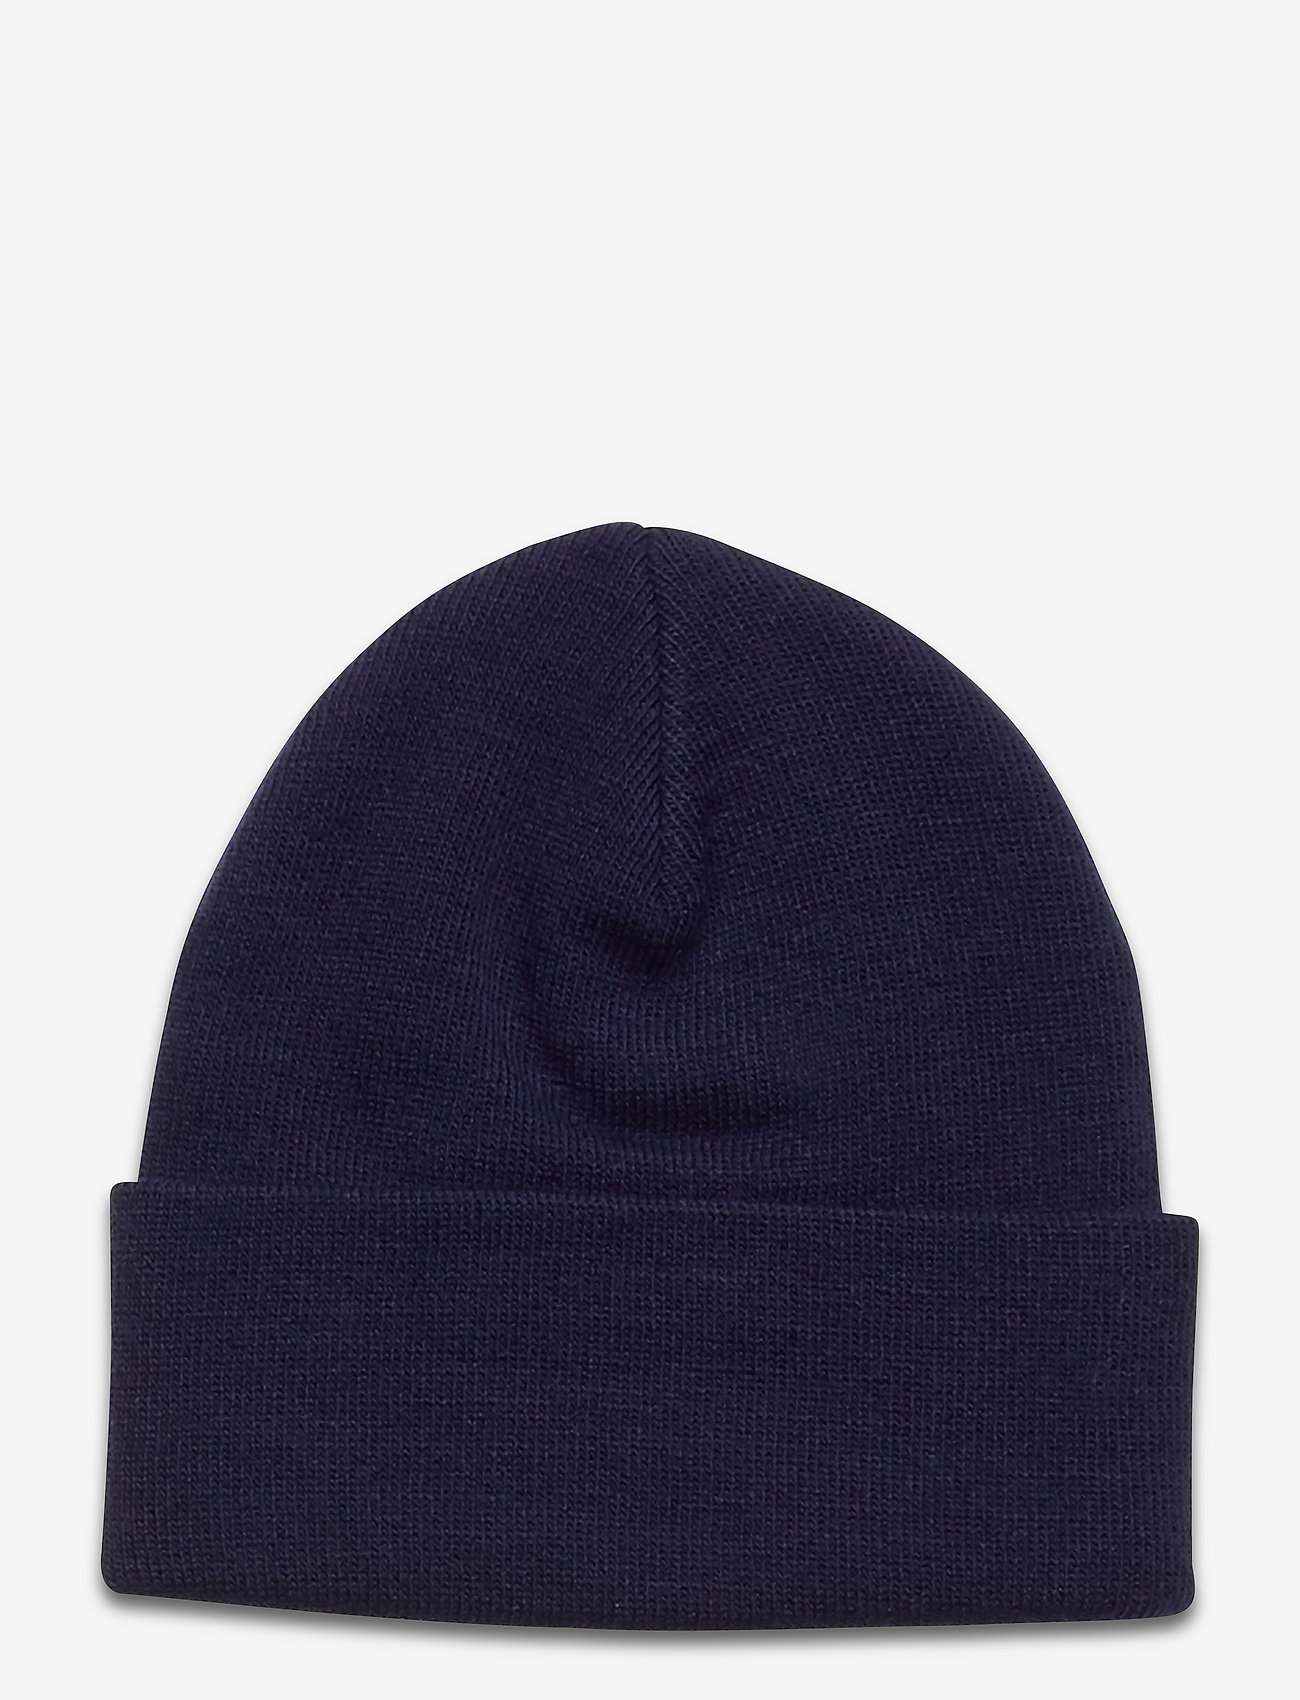 Levi's Footwear & Acc - SMALLER SERIF LOGO BEANIE - bonnet - navy blue - 1